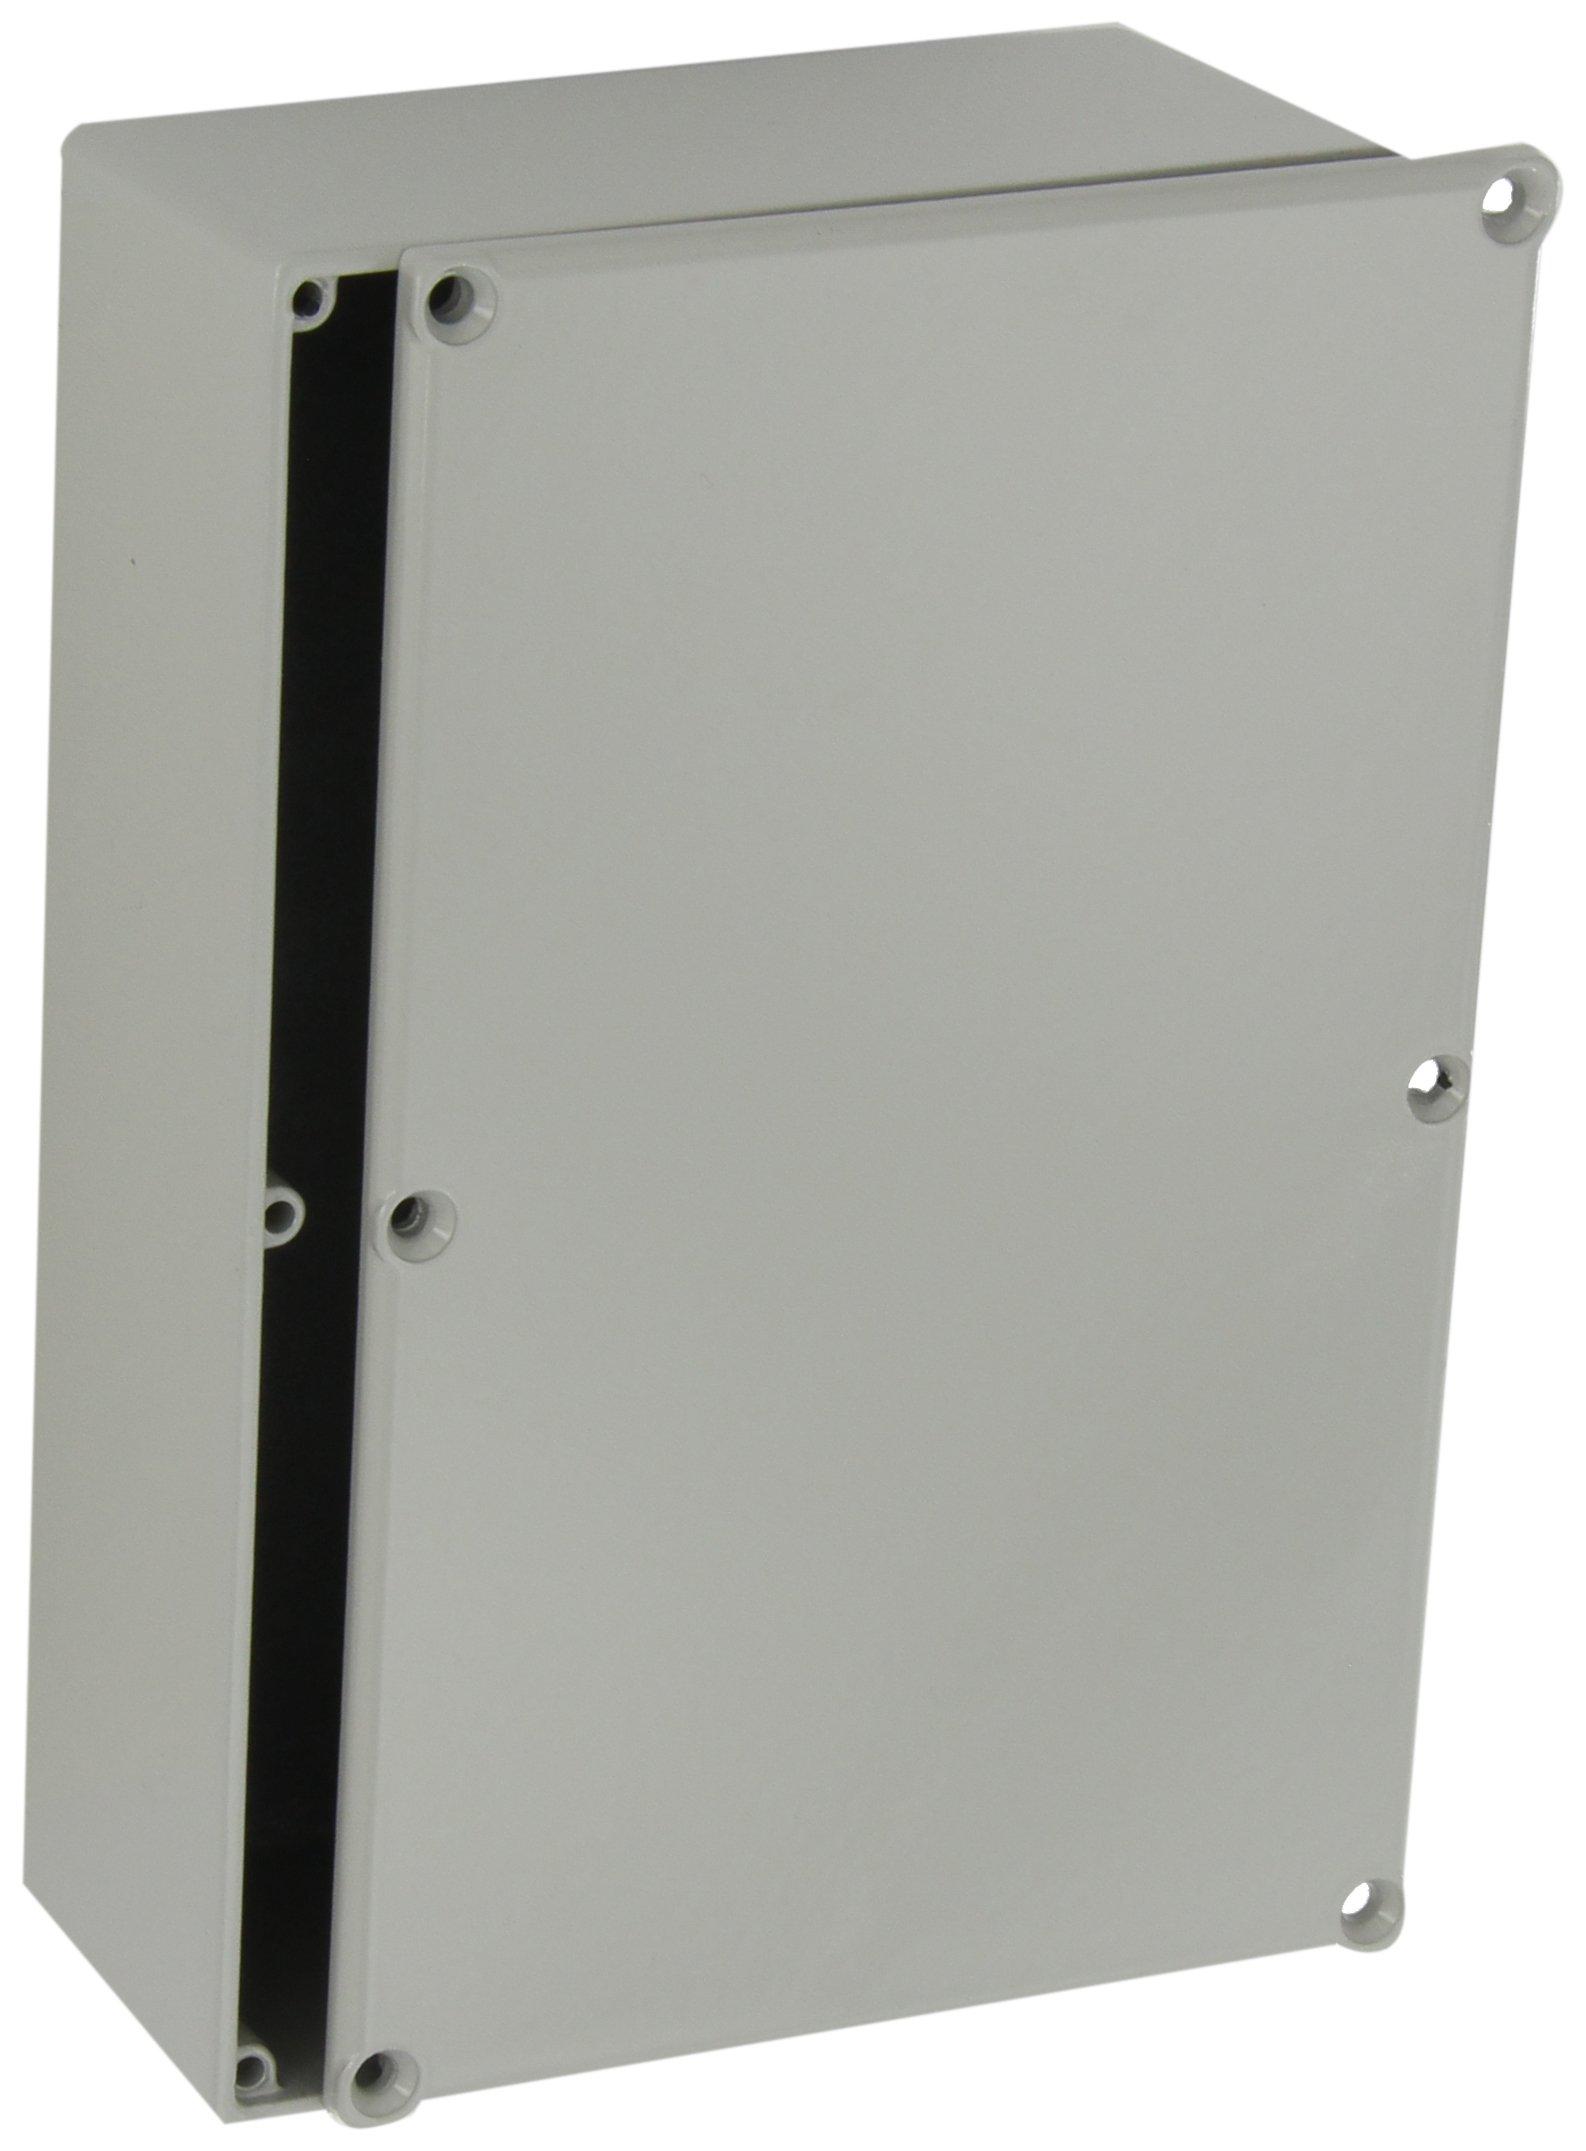 BUD Industries CU-247-G Aluminum Econobox, 7-3/8'' Length x 4-11/16'' Width x 2-13/64'' Height, Gray Painted Finish